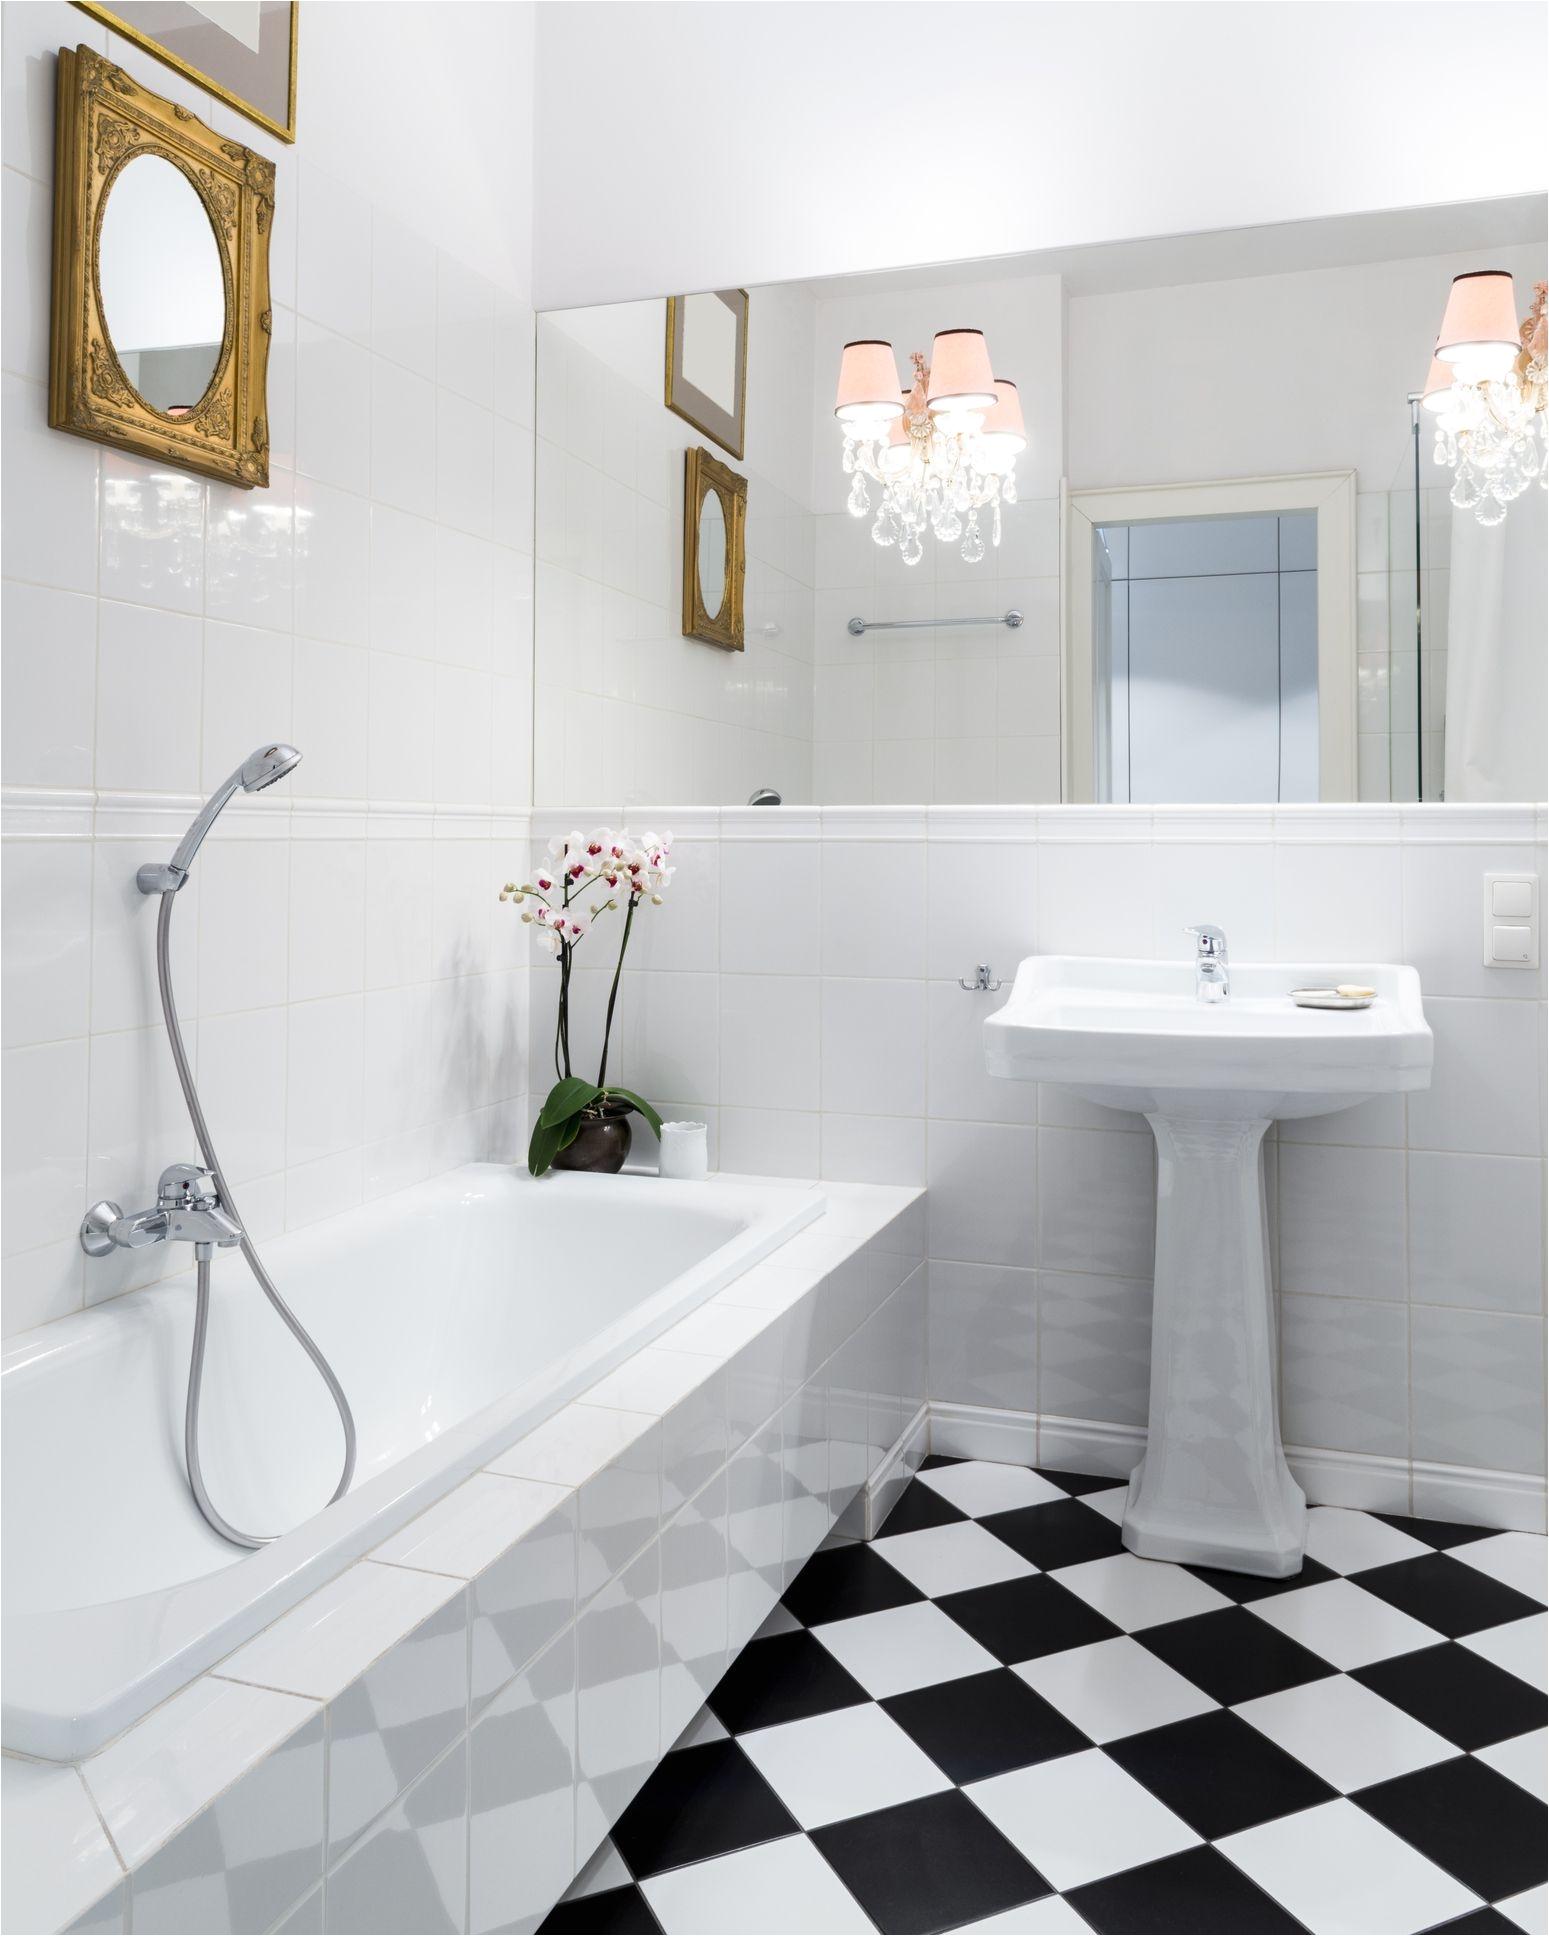 Bathroomlinoleumfloor Getty 59bbfe759abed ae1